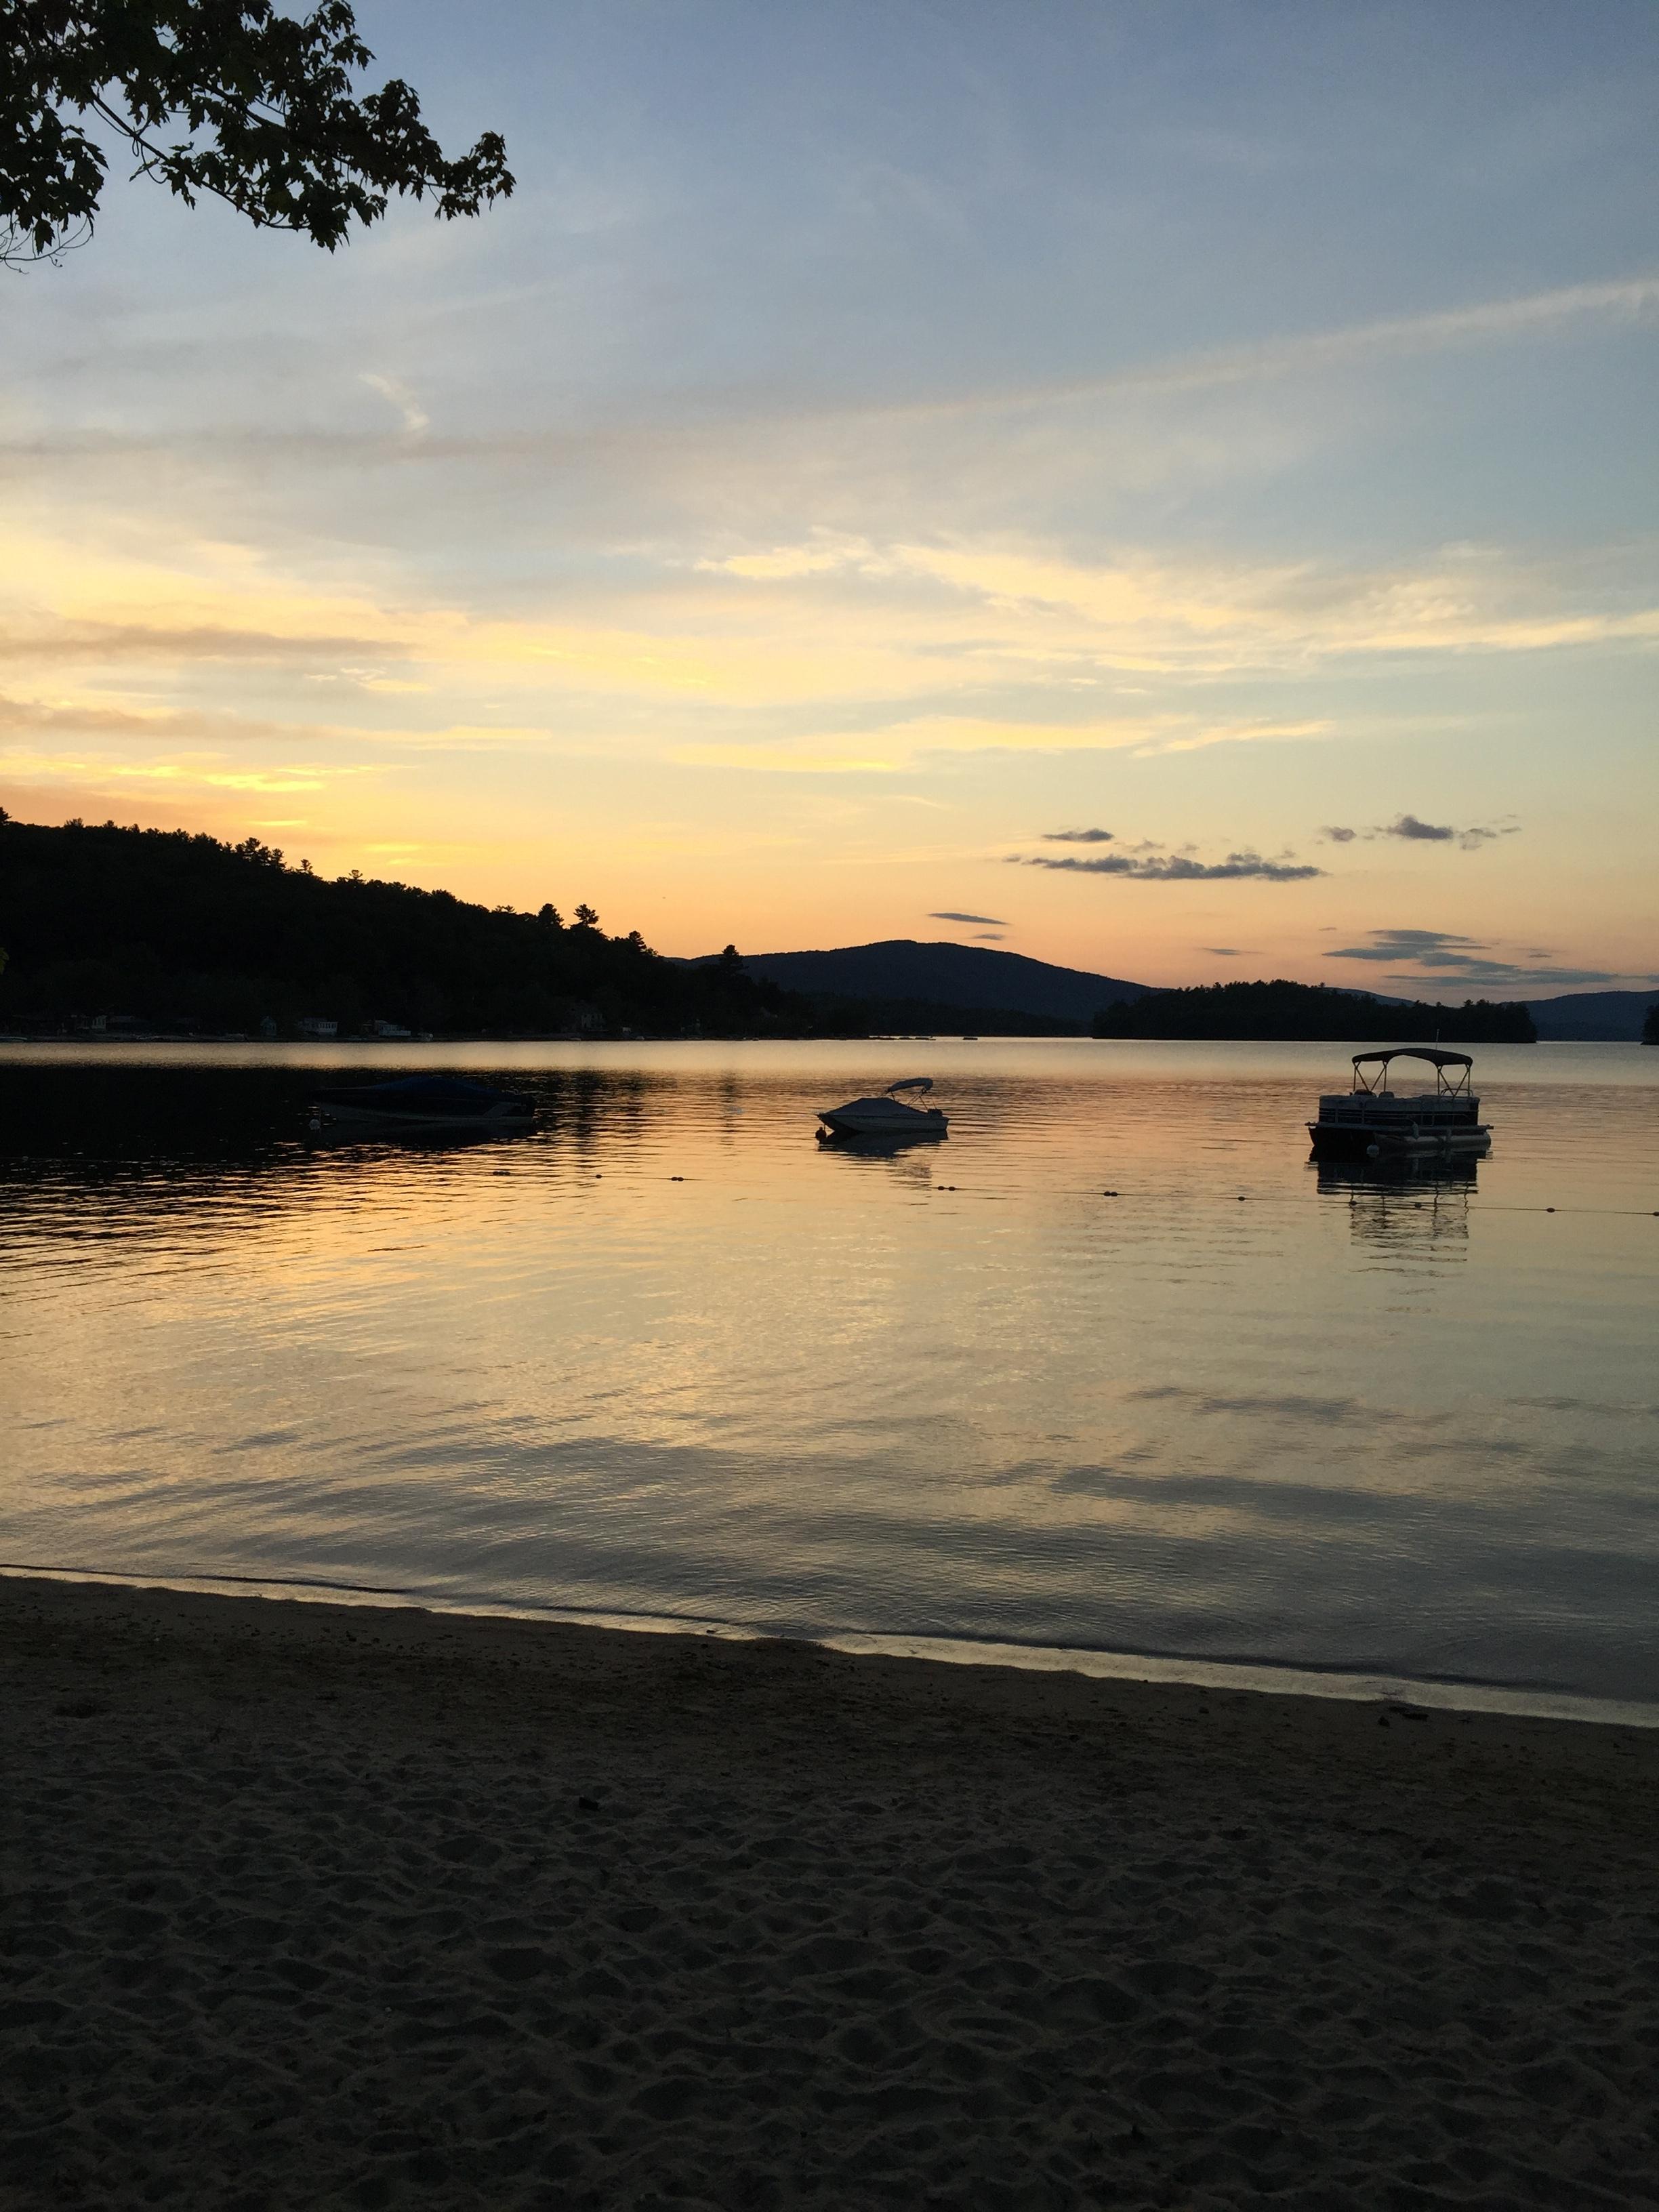 Newfound Lake at sunset